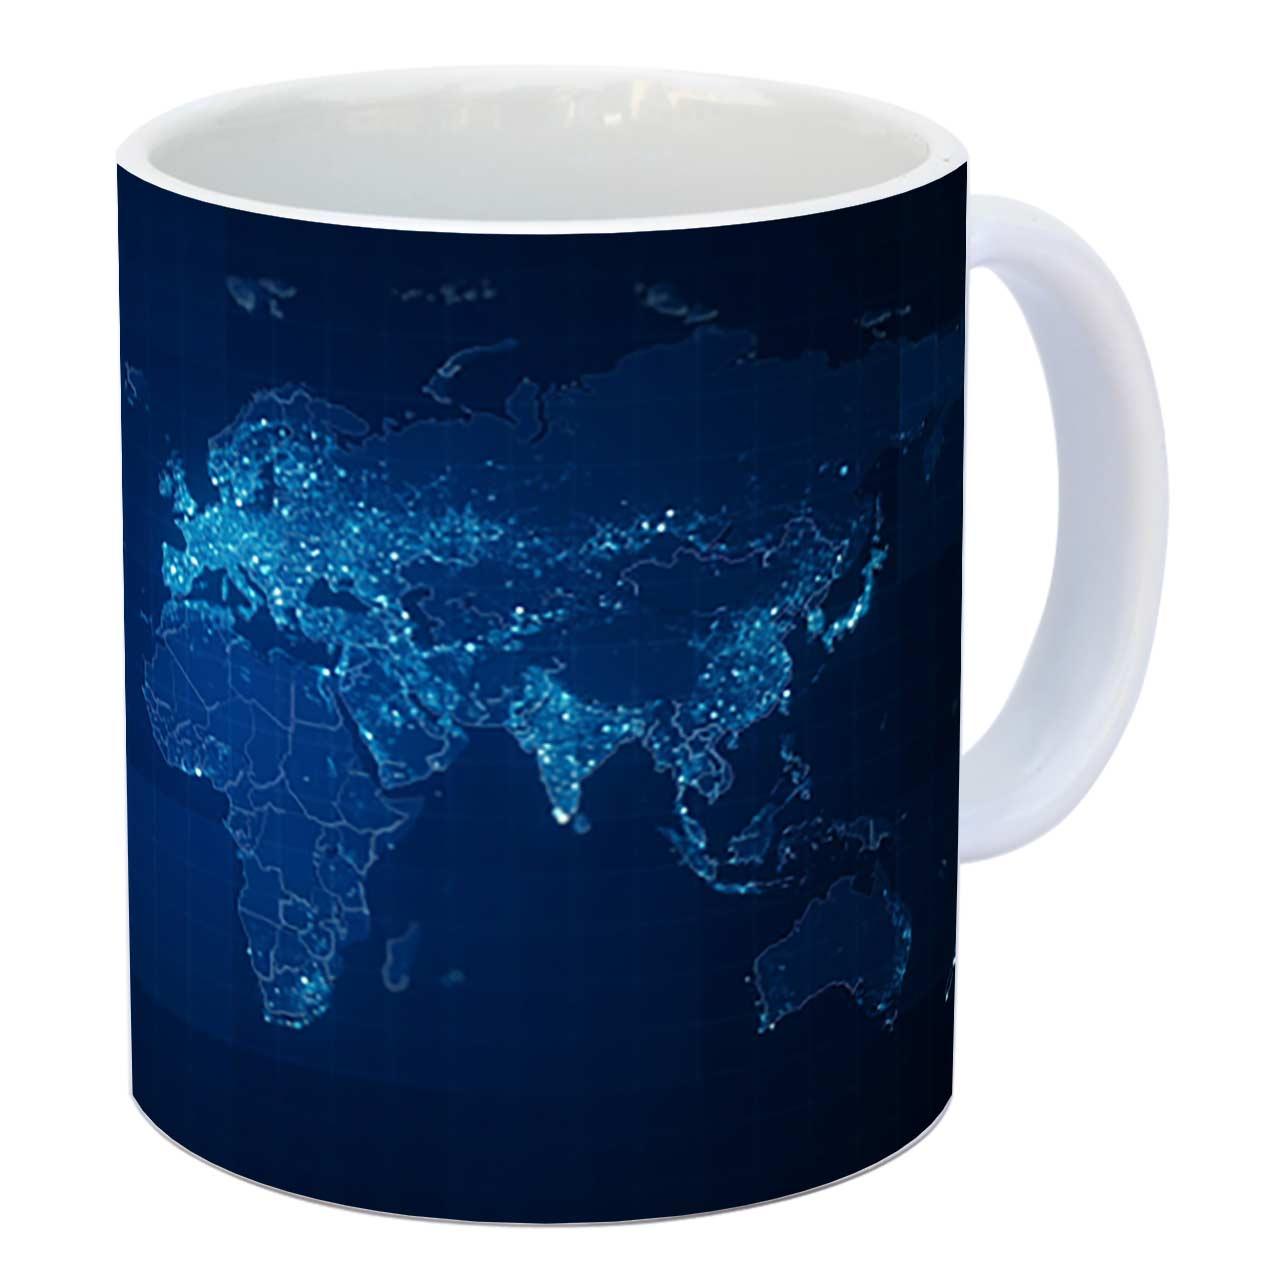 عکس ماگ زیزیپ طرح کره زمین کد 1419